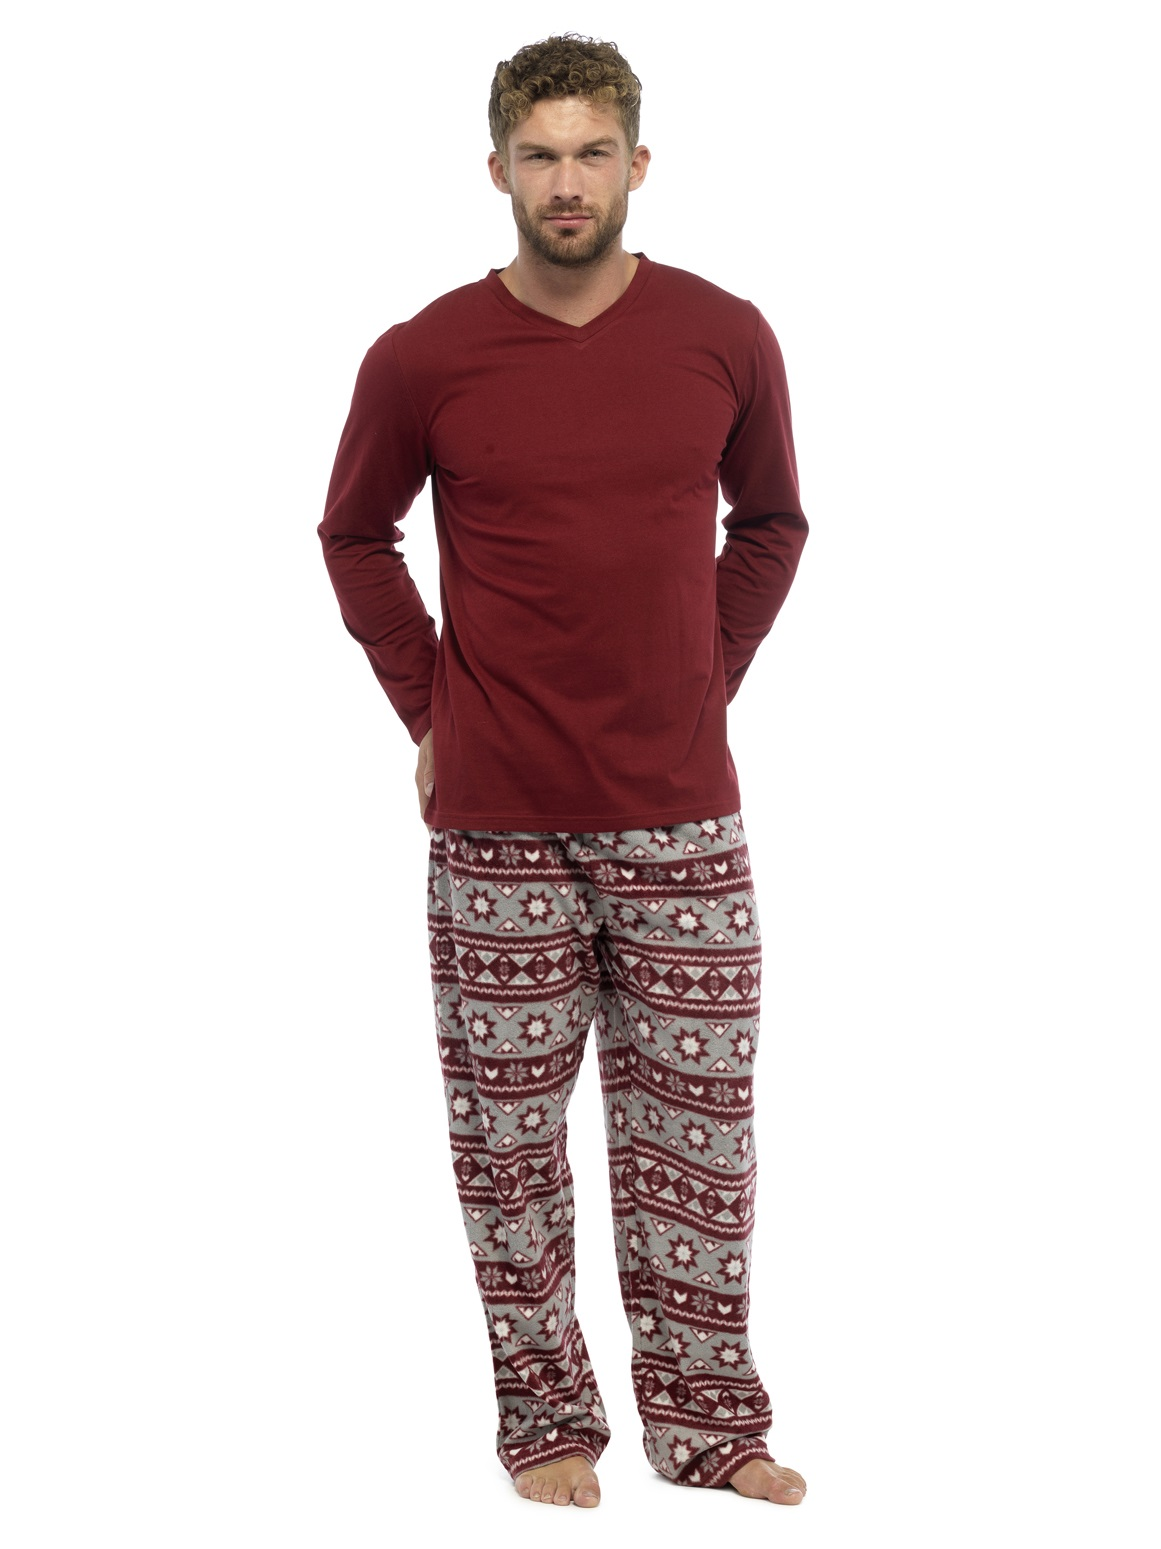 Mens 2 Piece Luxury Full Length Pyjamas Set Gents Boys Pjs Pj's Gift ...